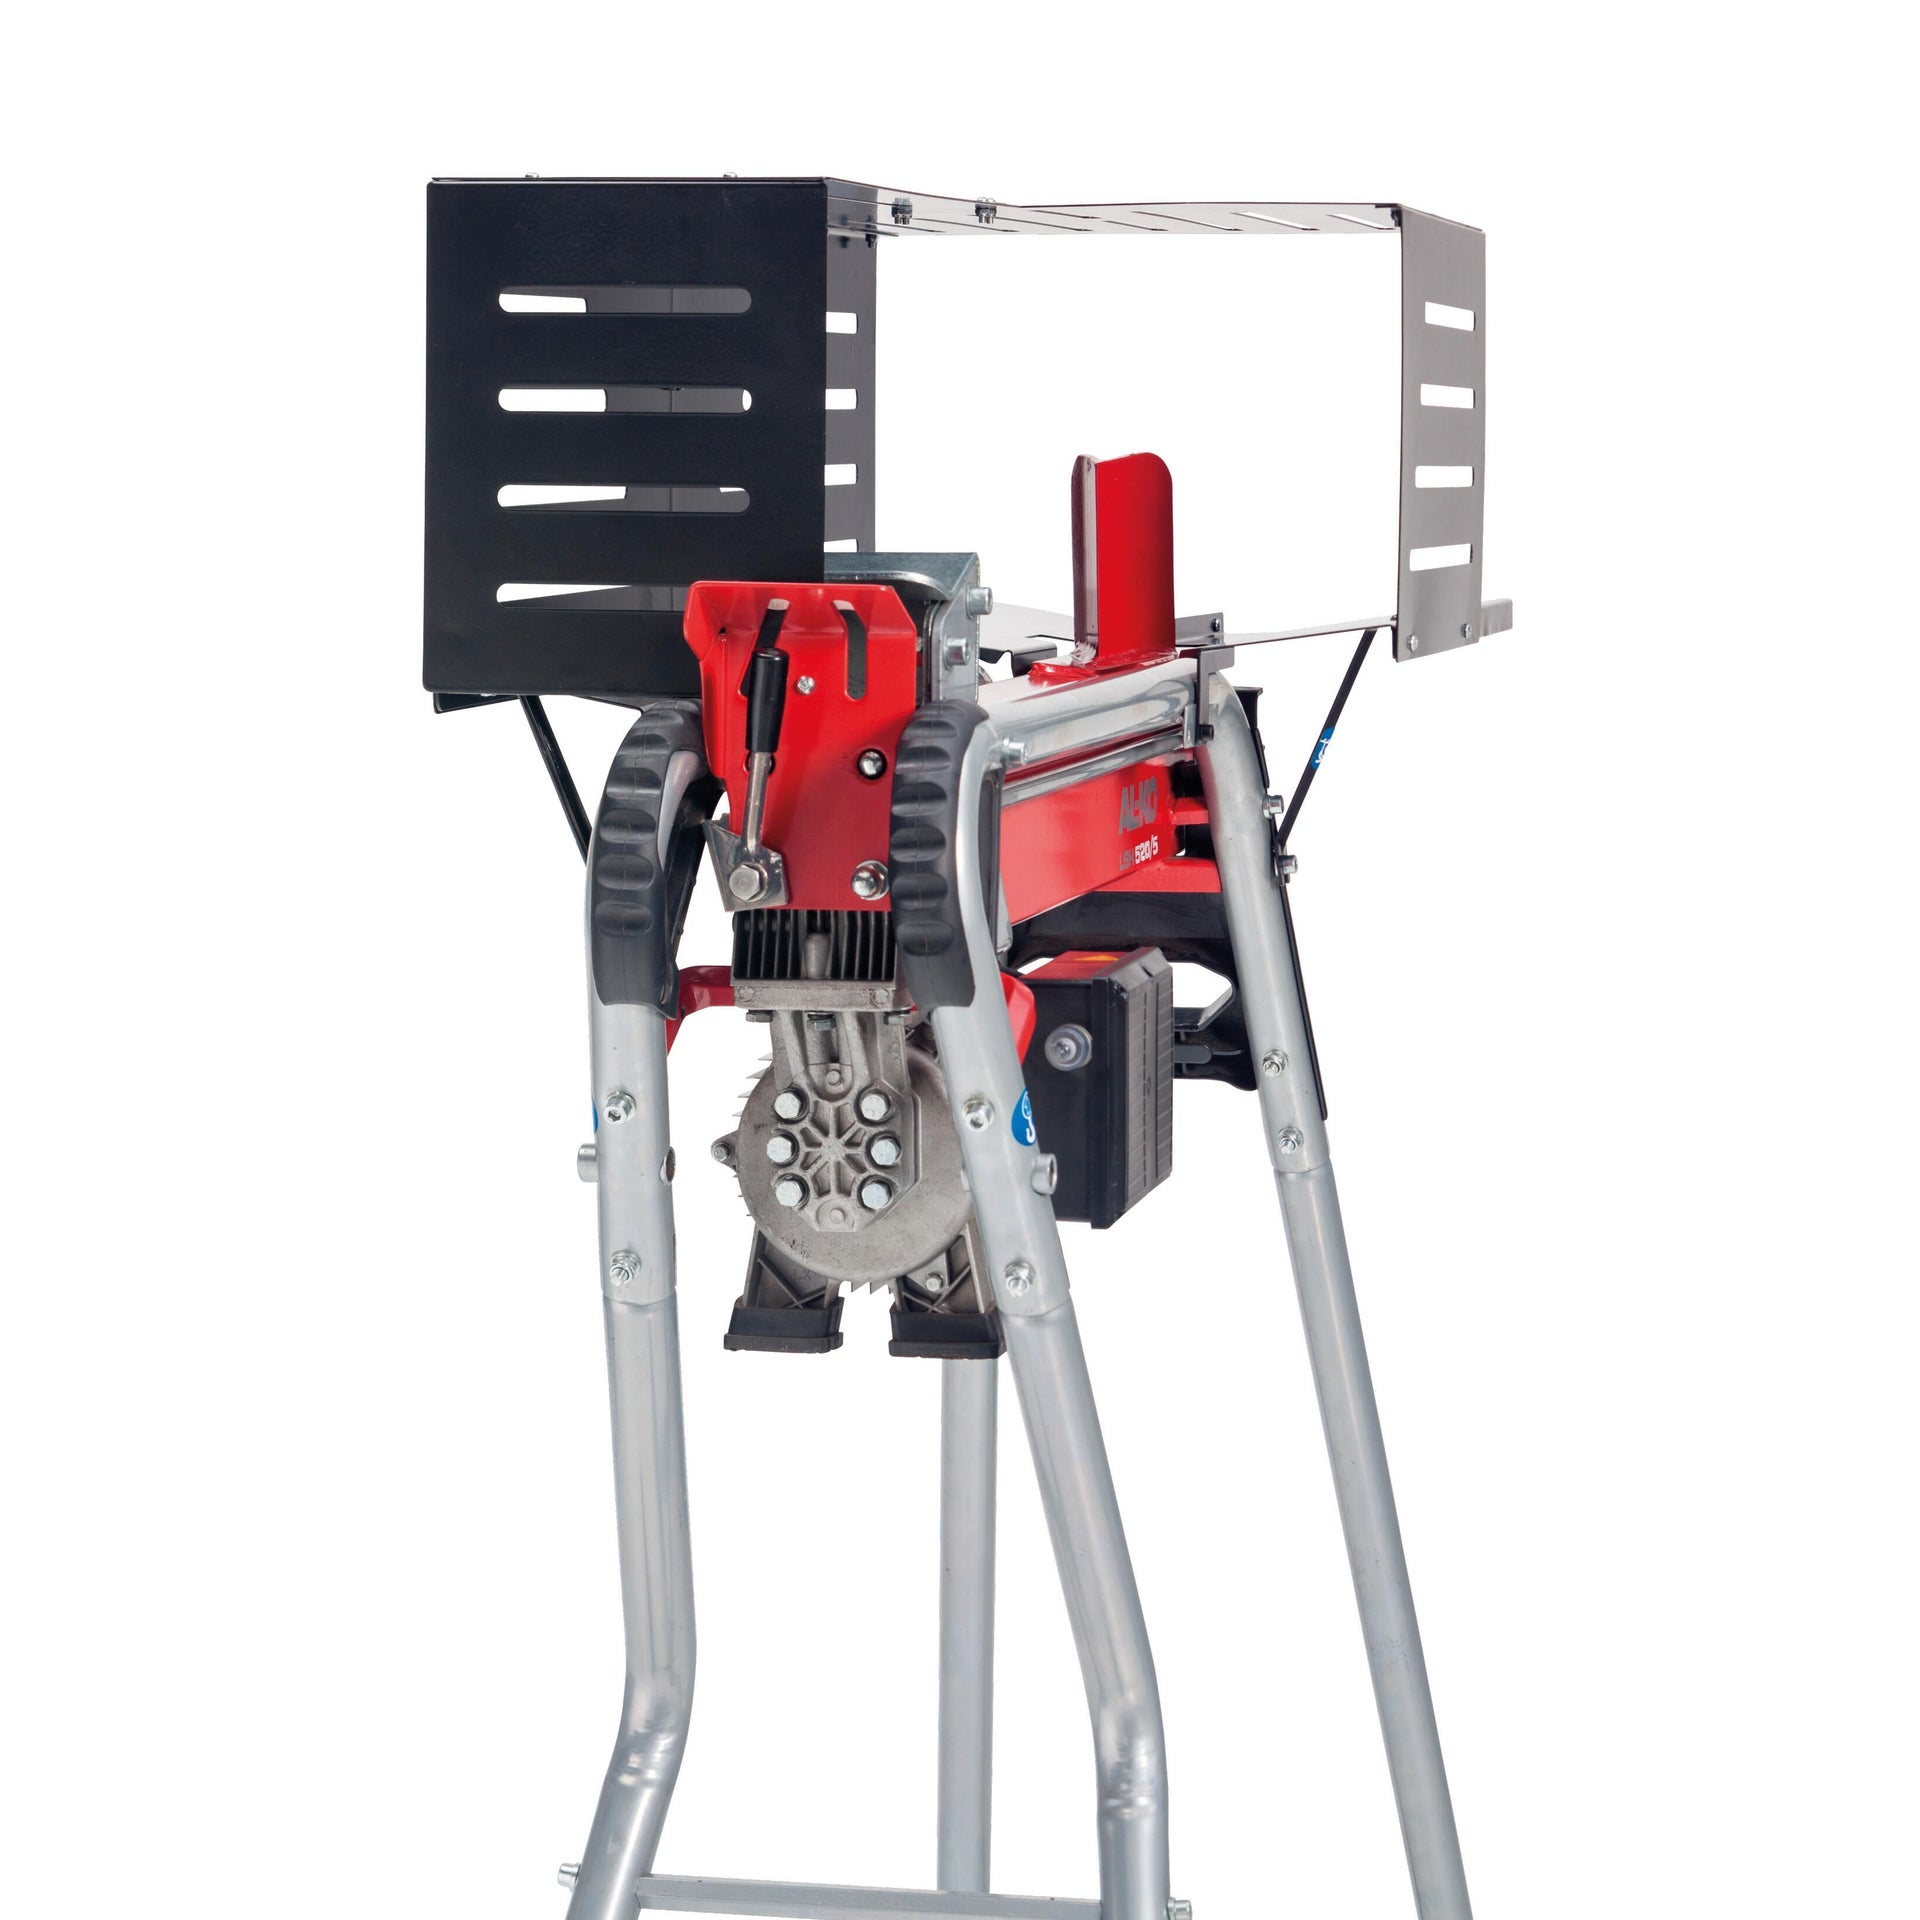 Spaccalegna elettrico Orizzontale AL-KO LSH 520/5 2200 W - 4